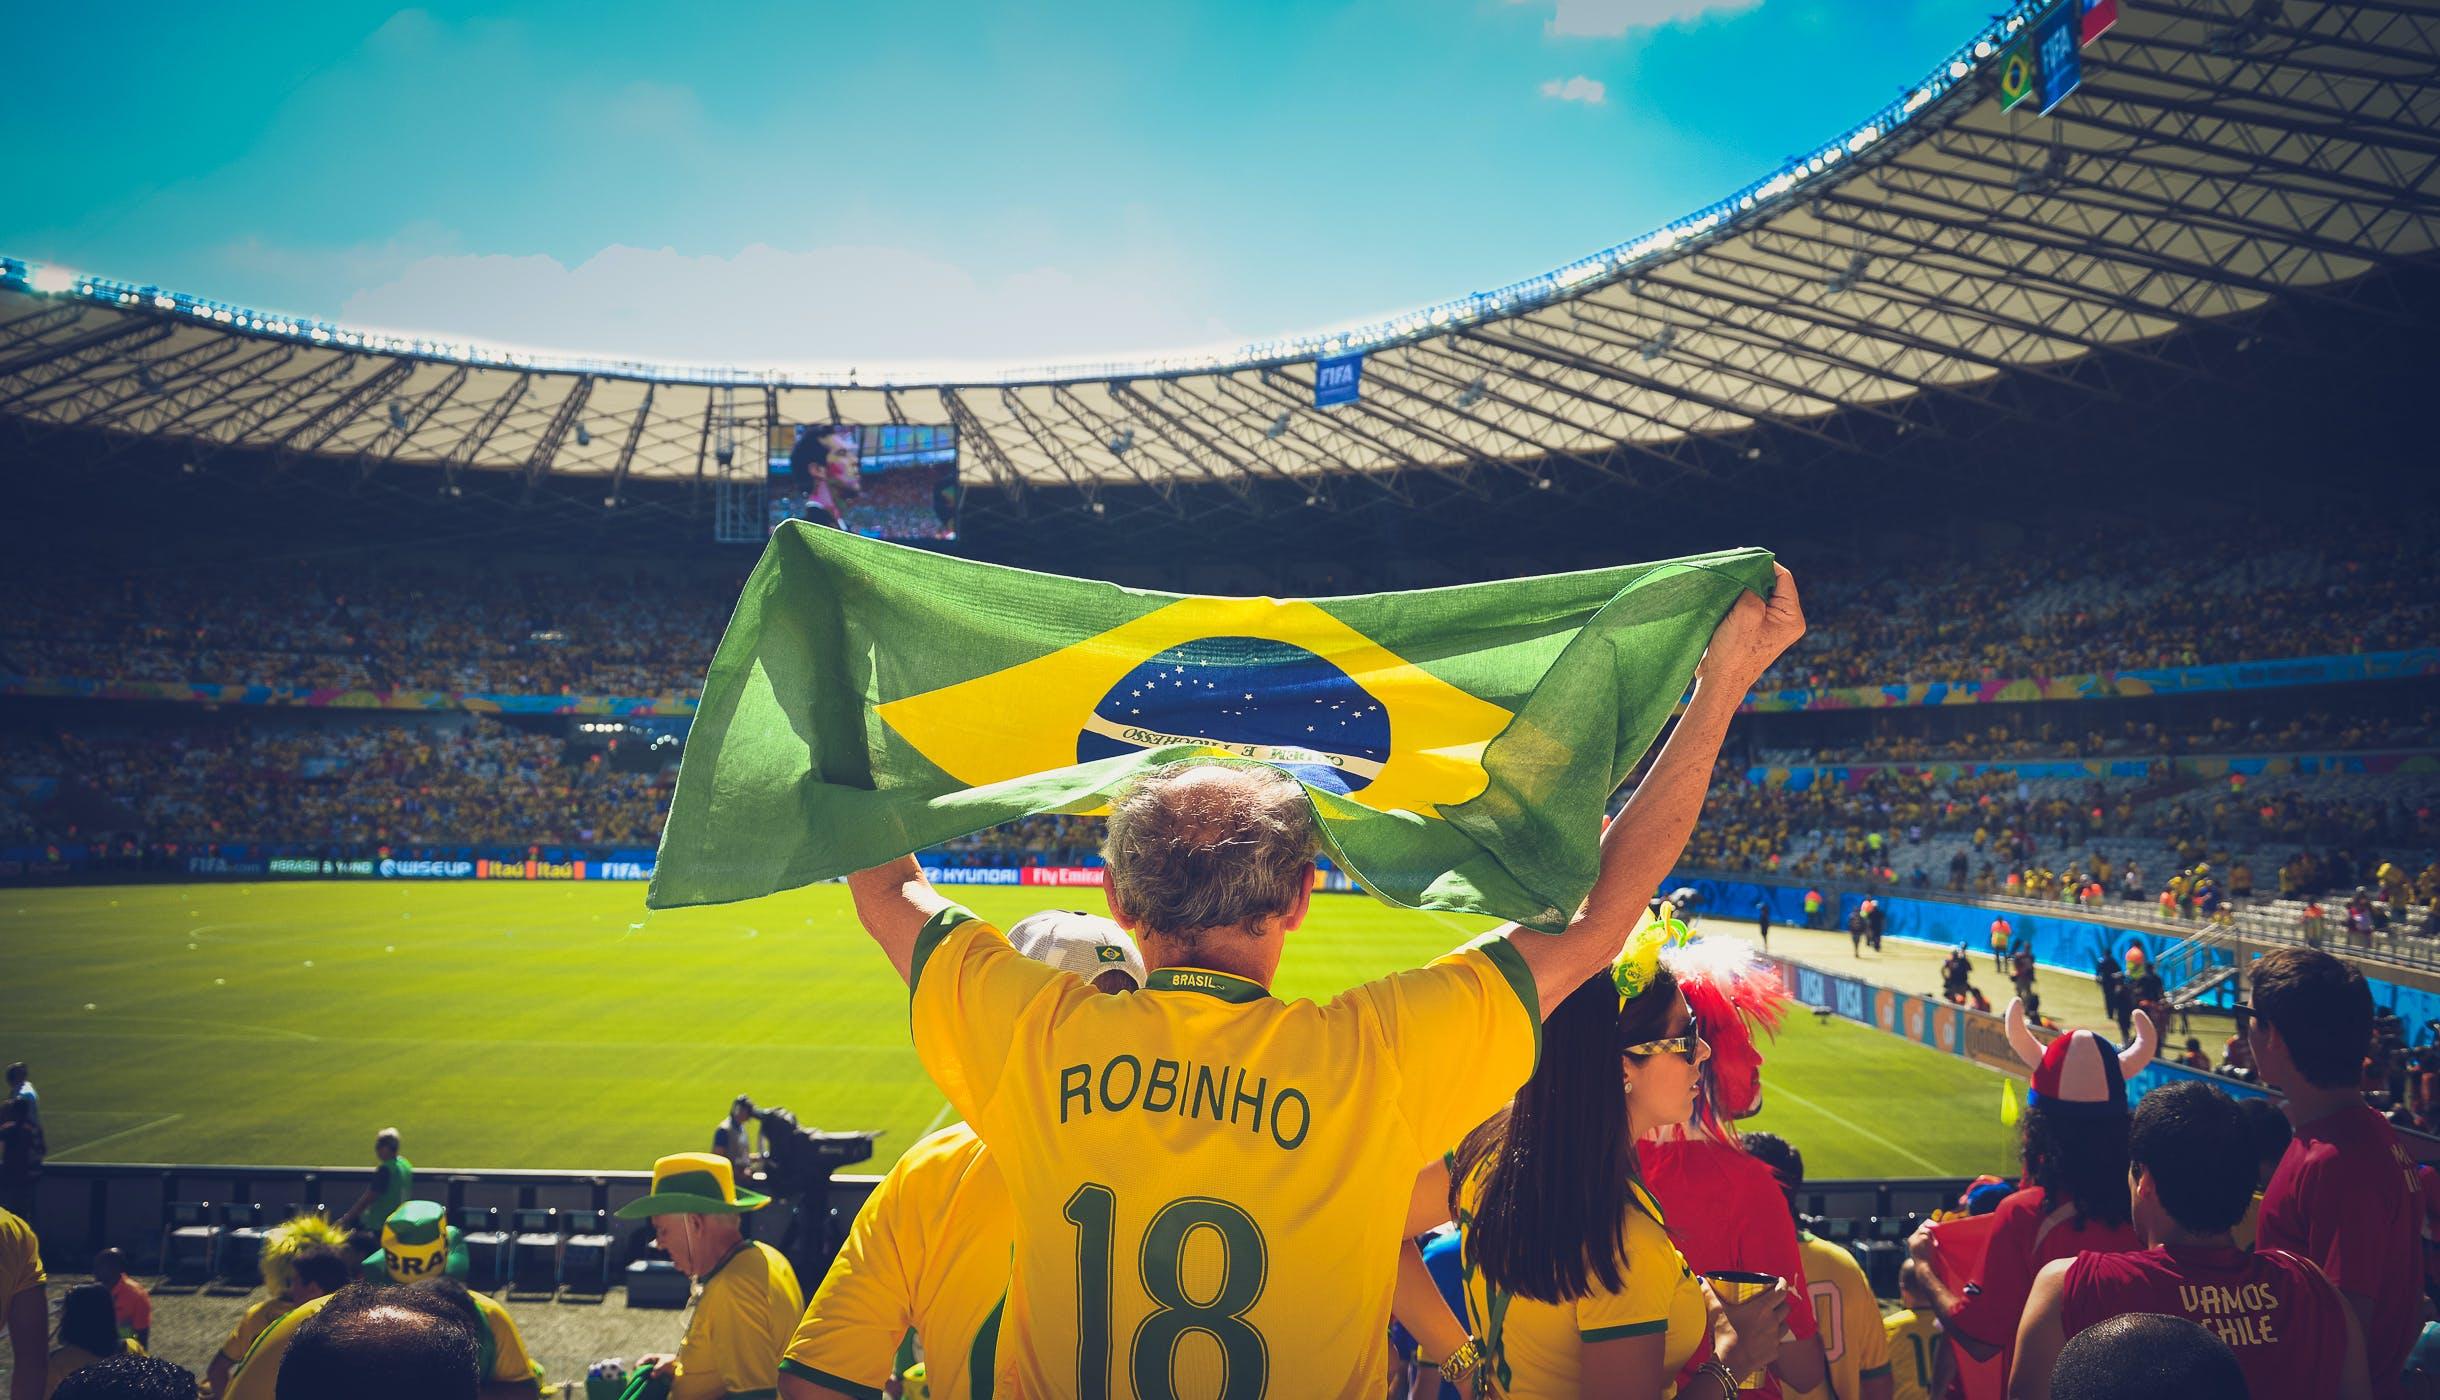 #18, audience, brazil